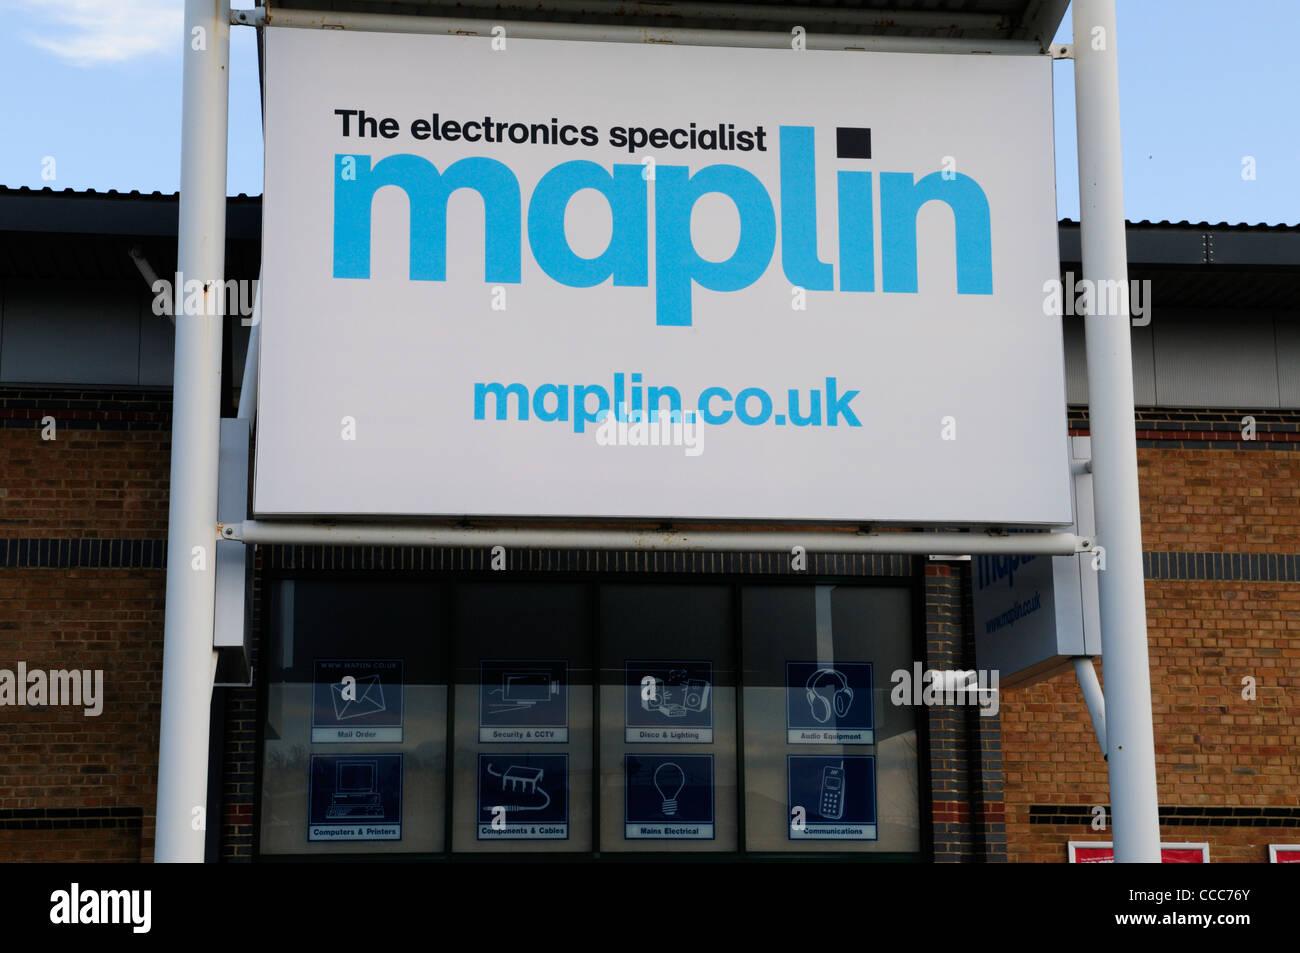 Maplin The Electronics Specialist Shop, Cambridge, England, UK - Stock Image